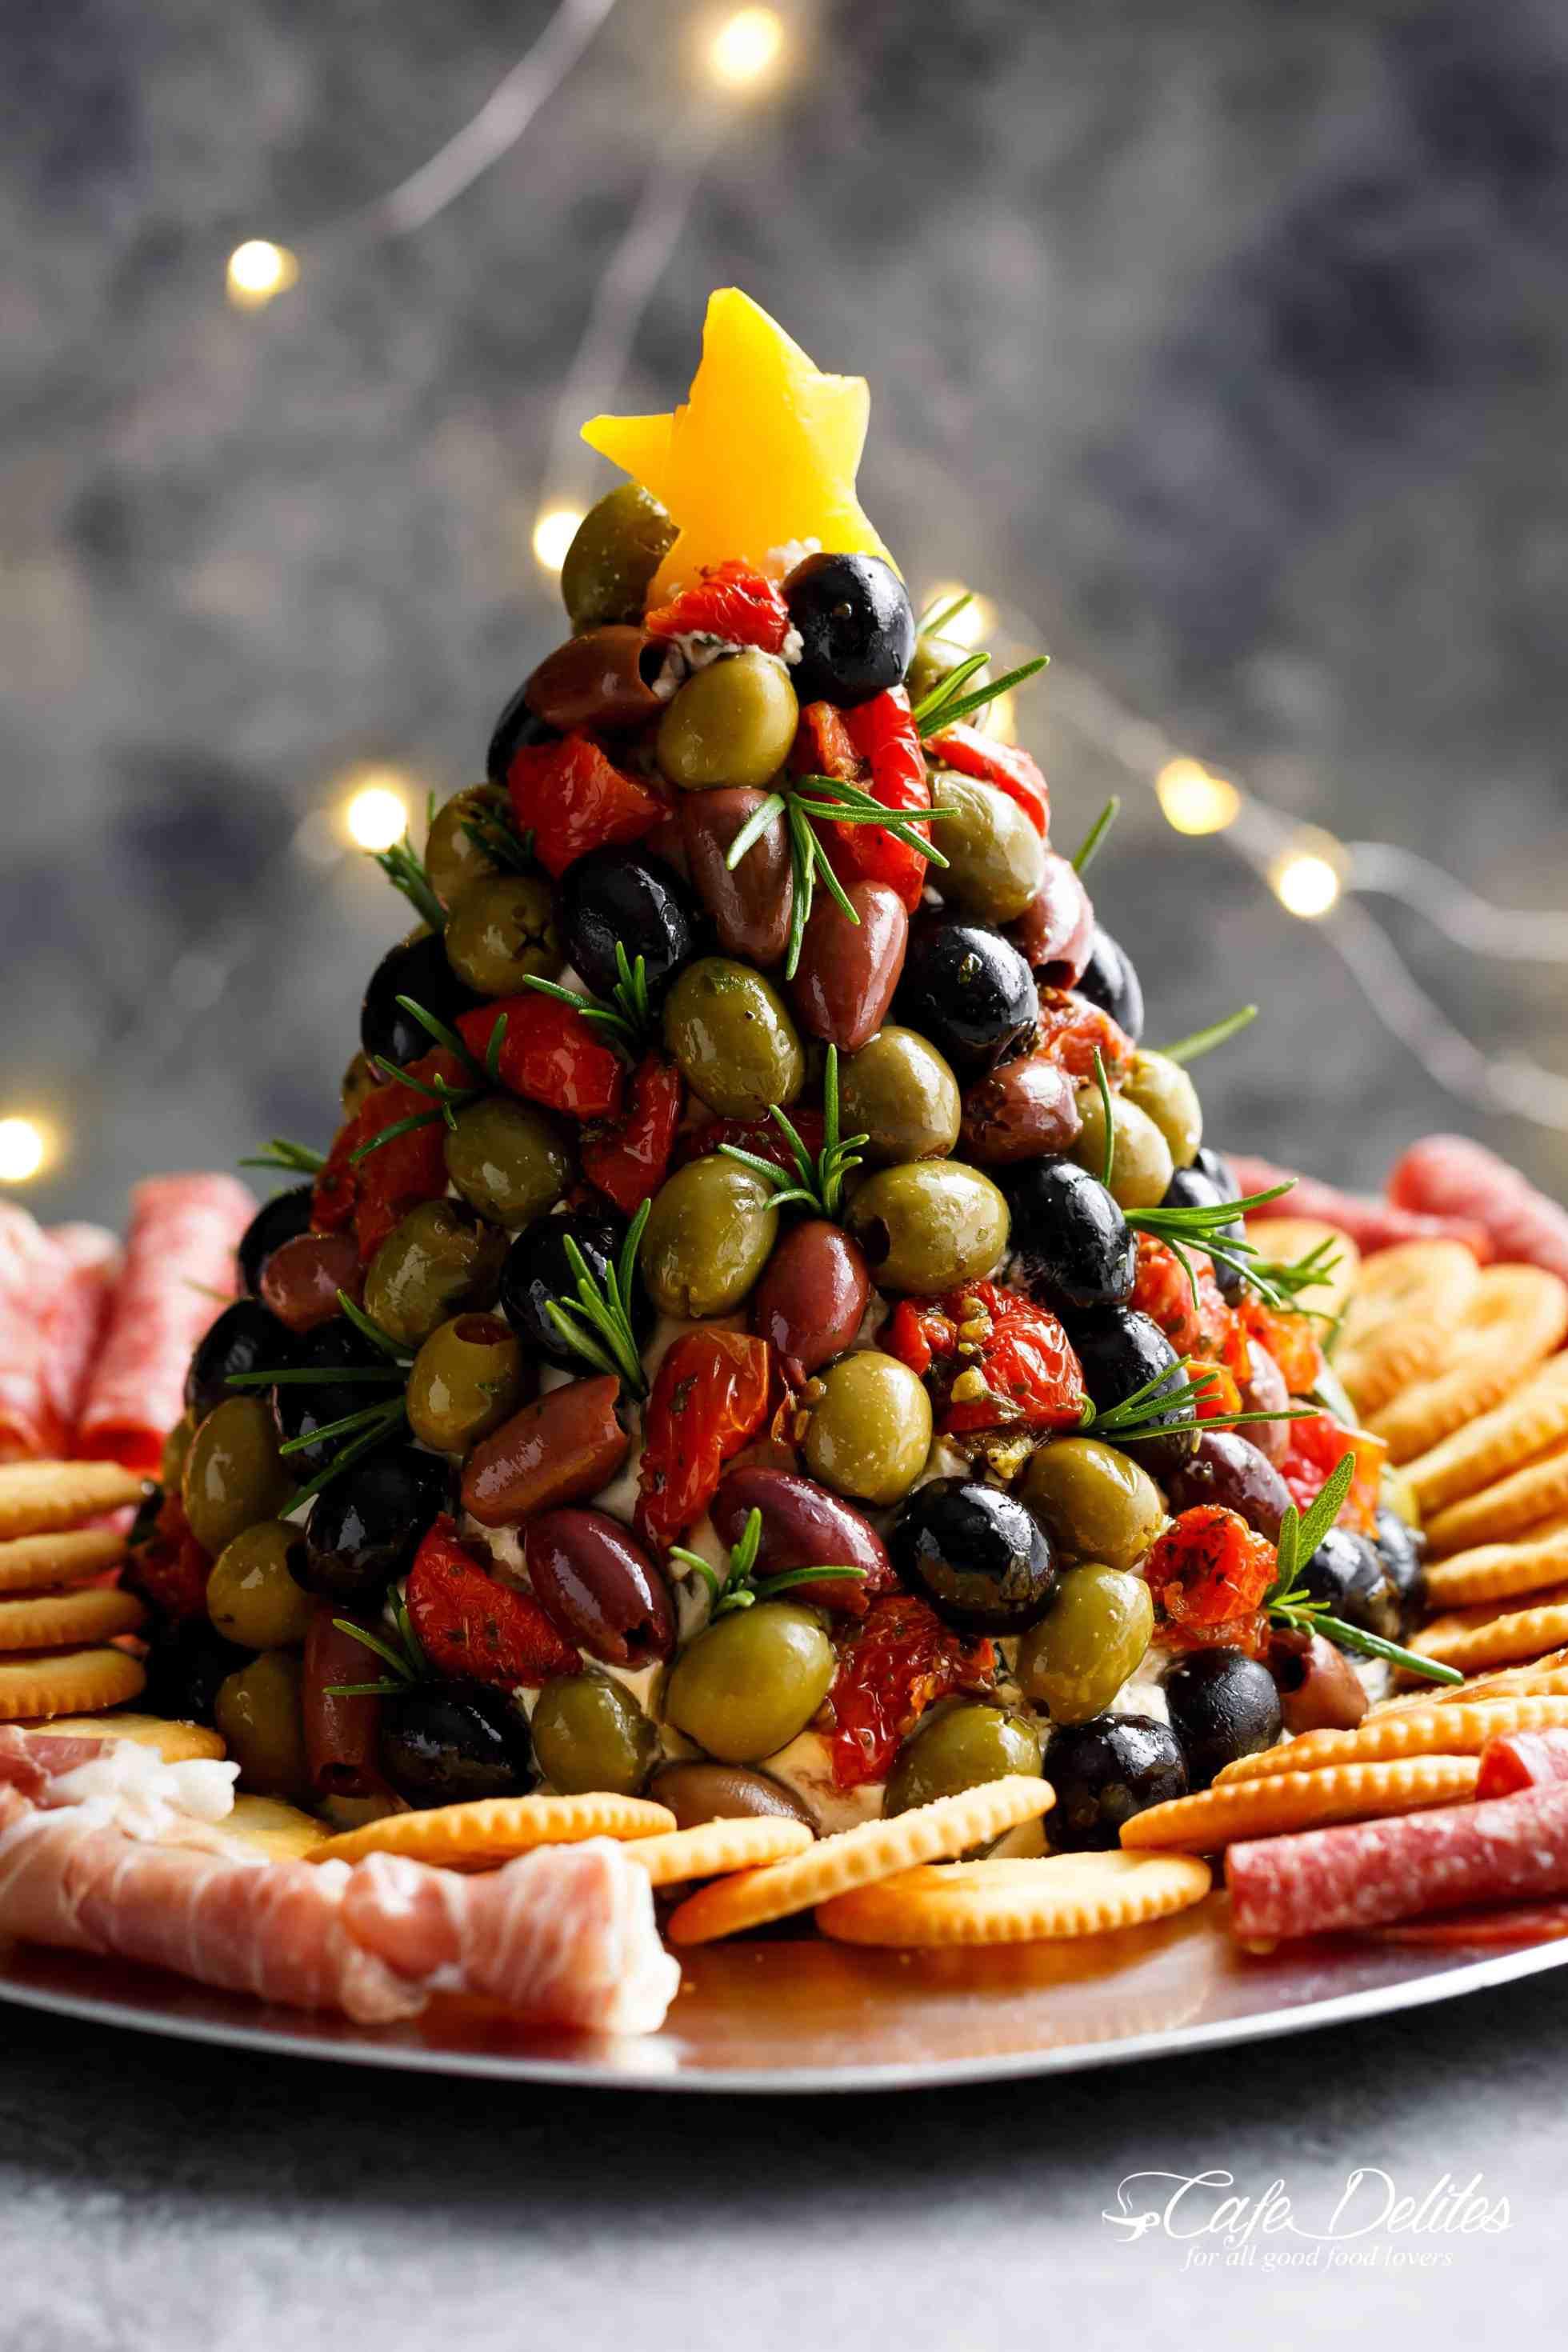 Antipasto grazing platter in shape of Christmas tree